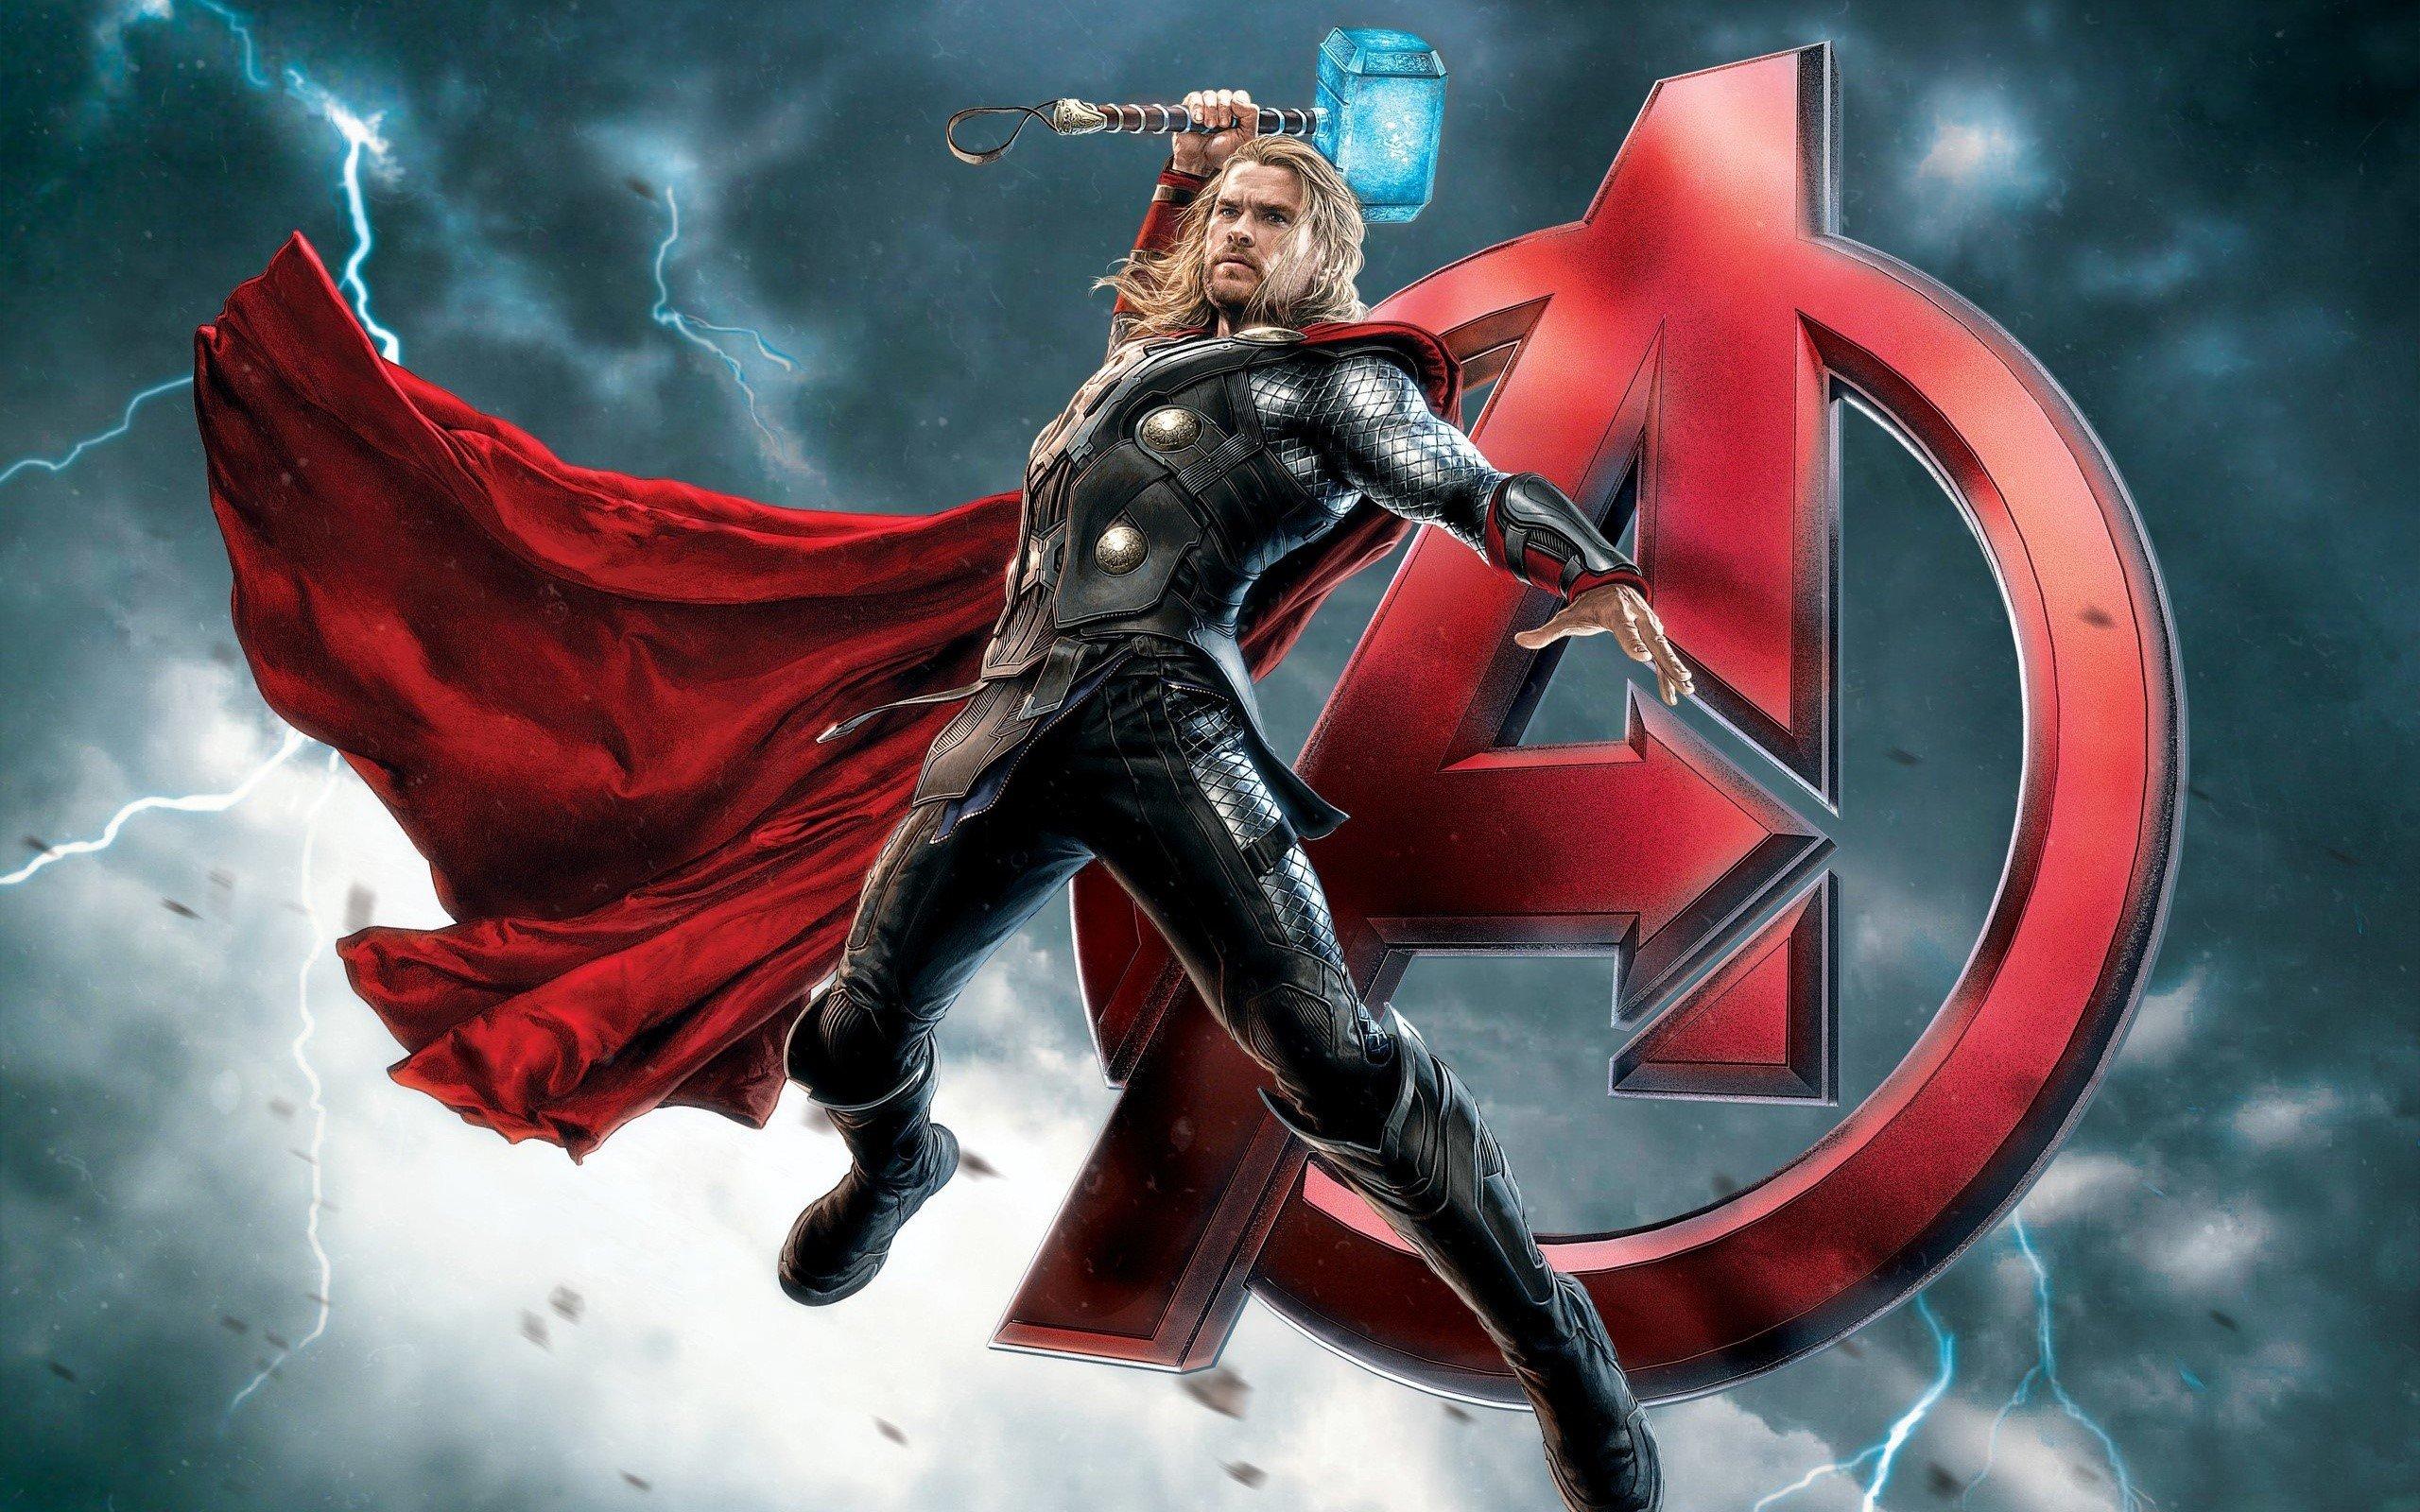 Wallpaper Thor in The Avengers